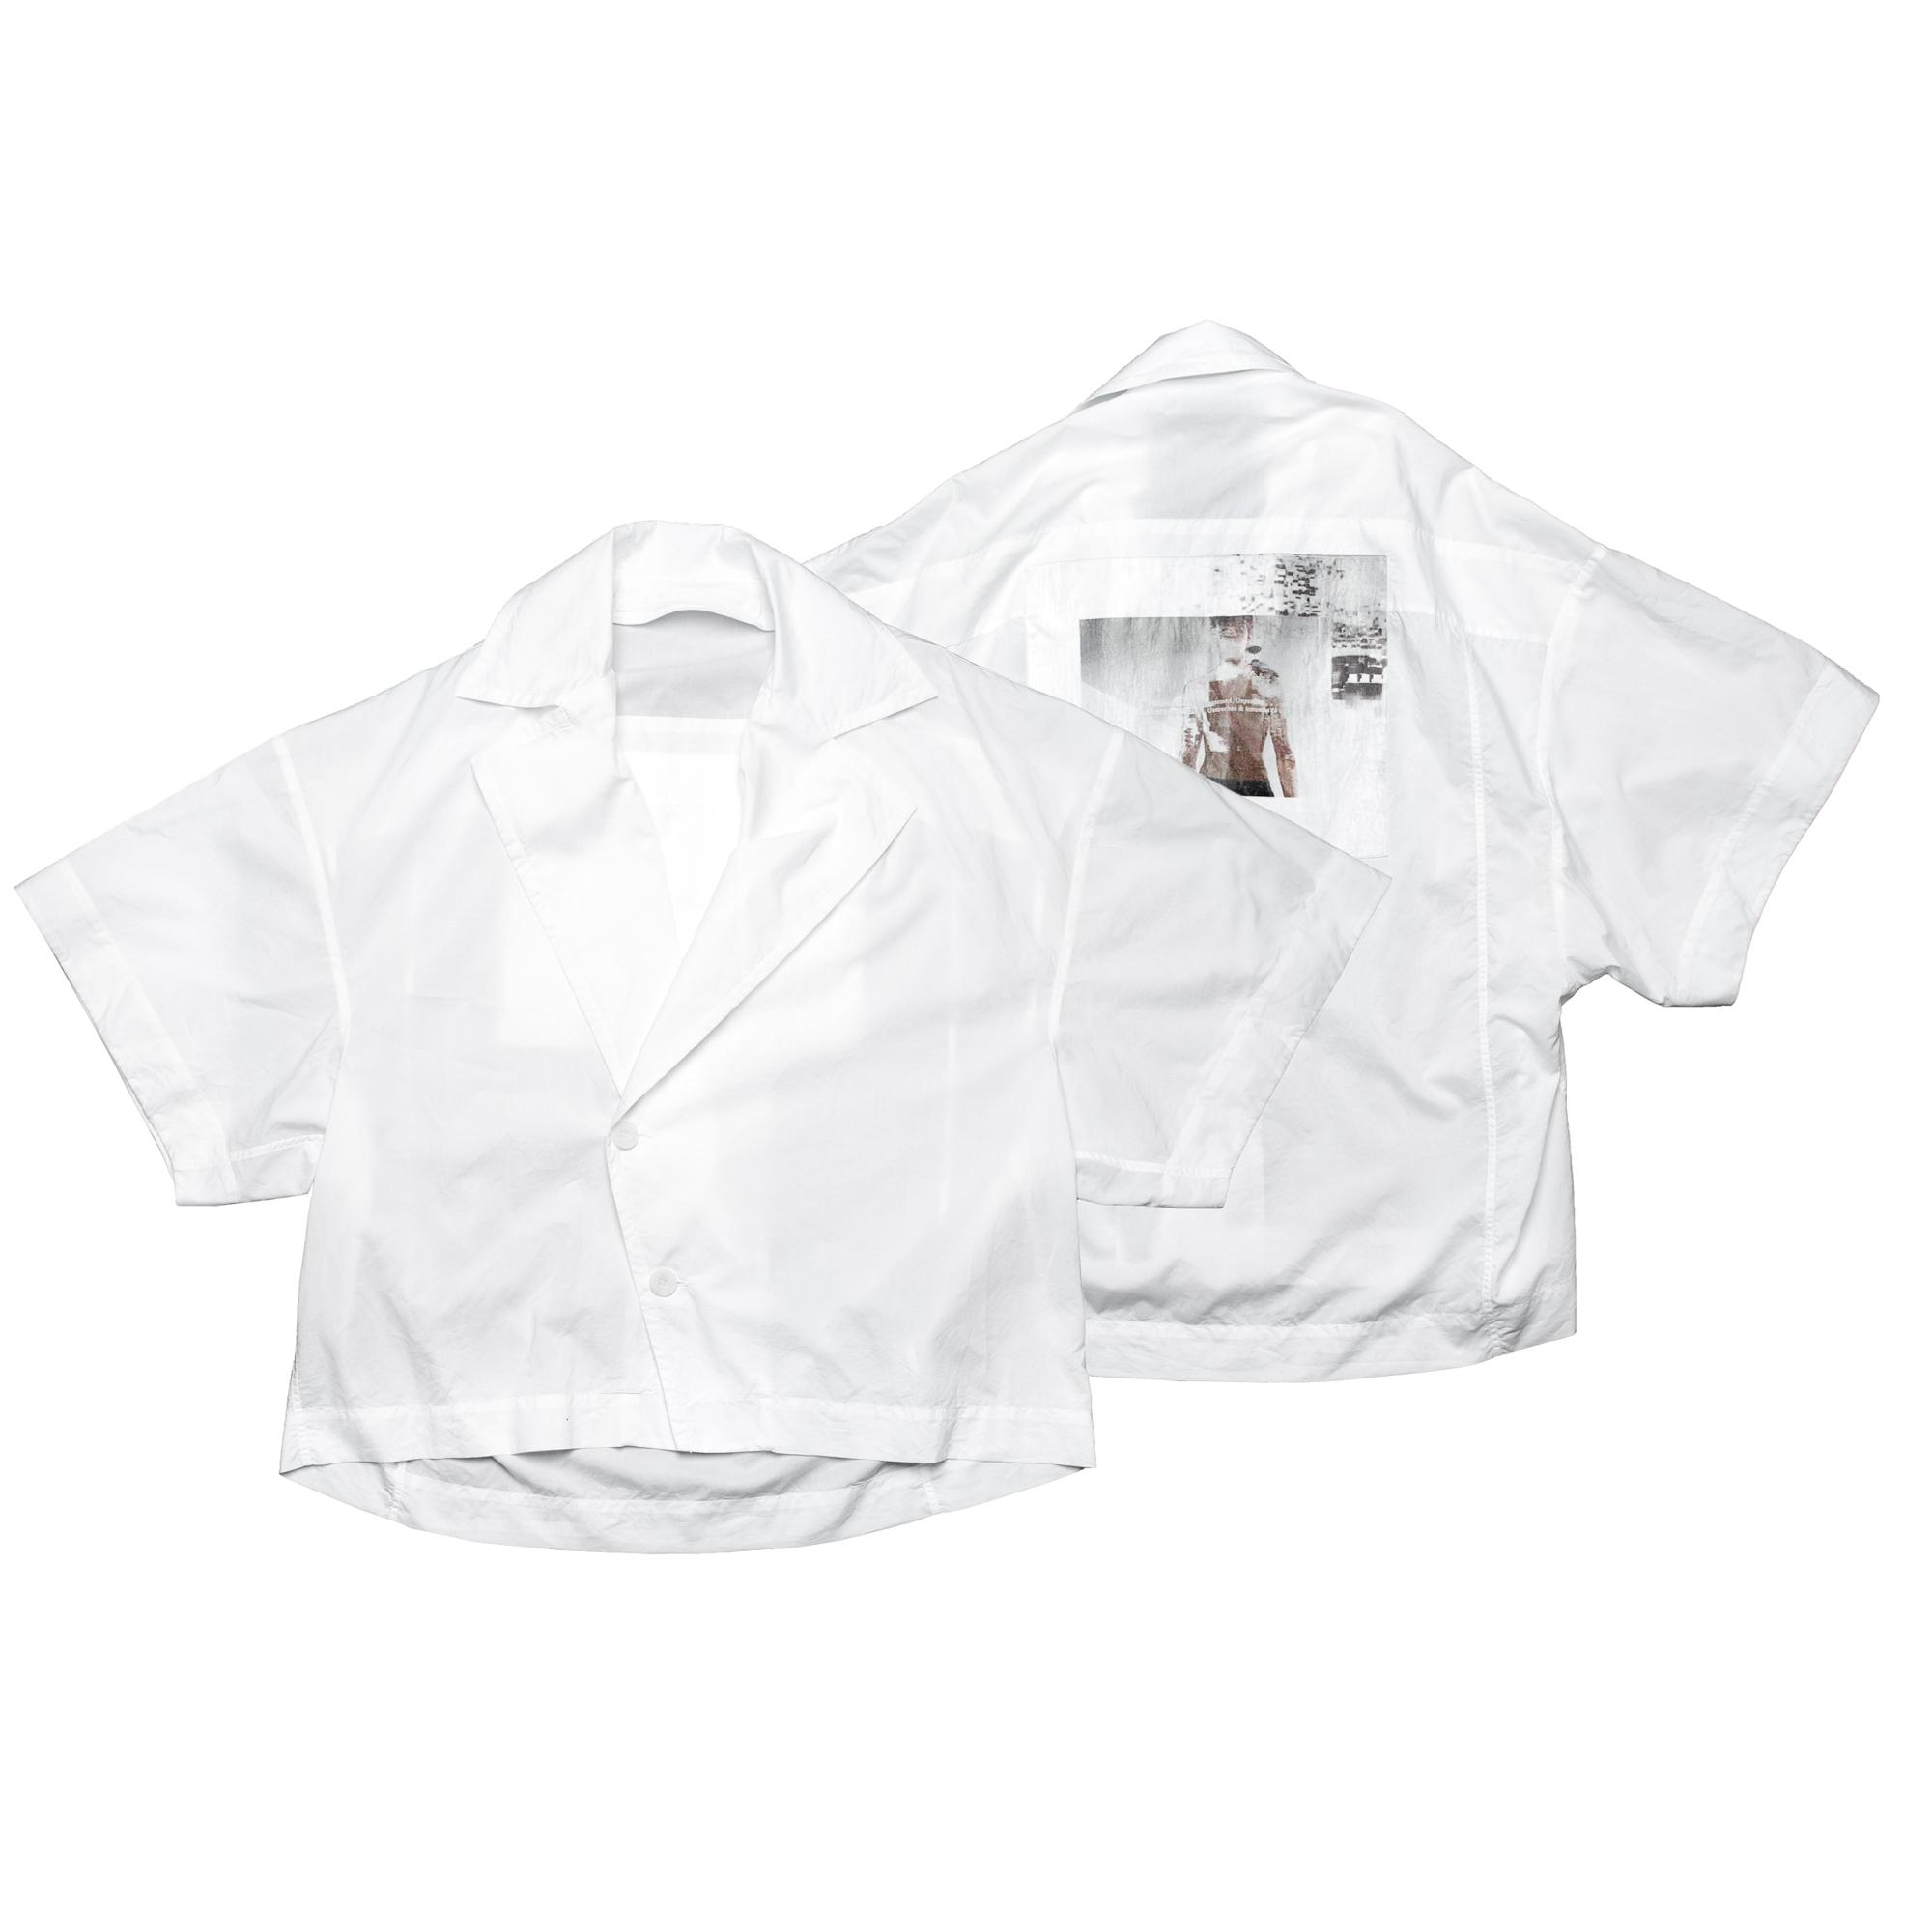 657SHM3-P-WHITE / プリントオープンカラーボックスシャツ